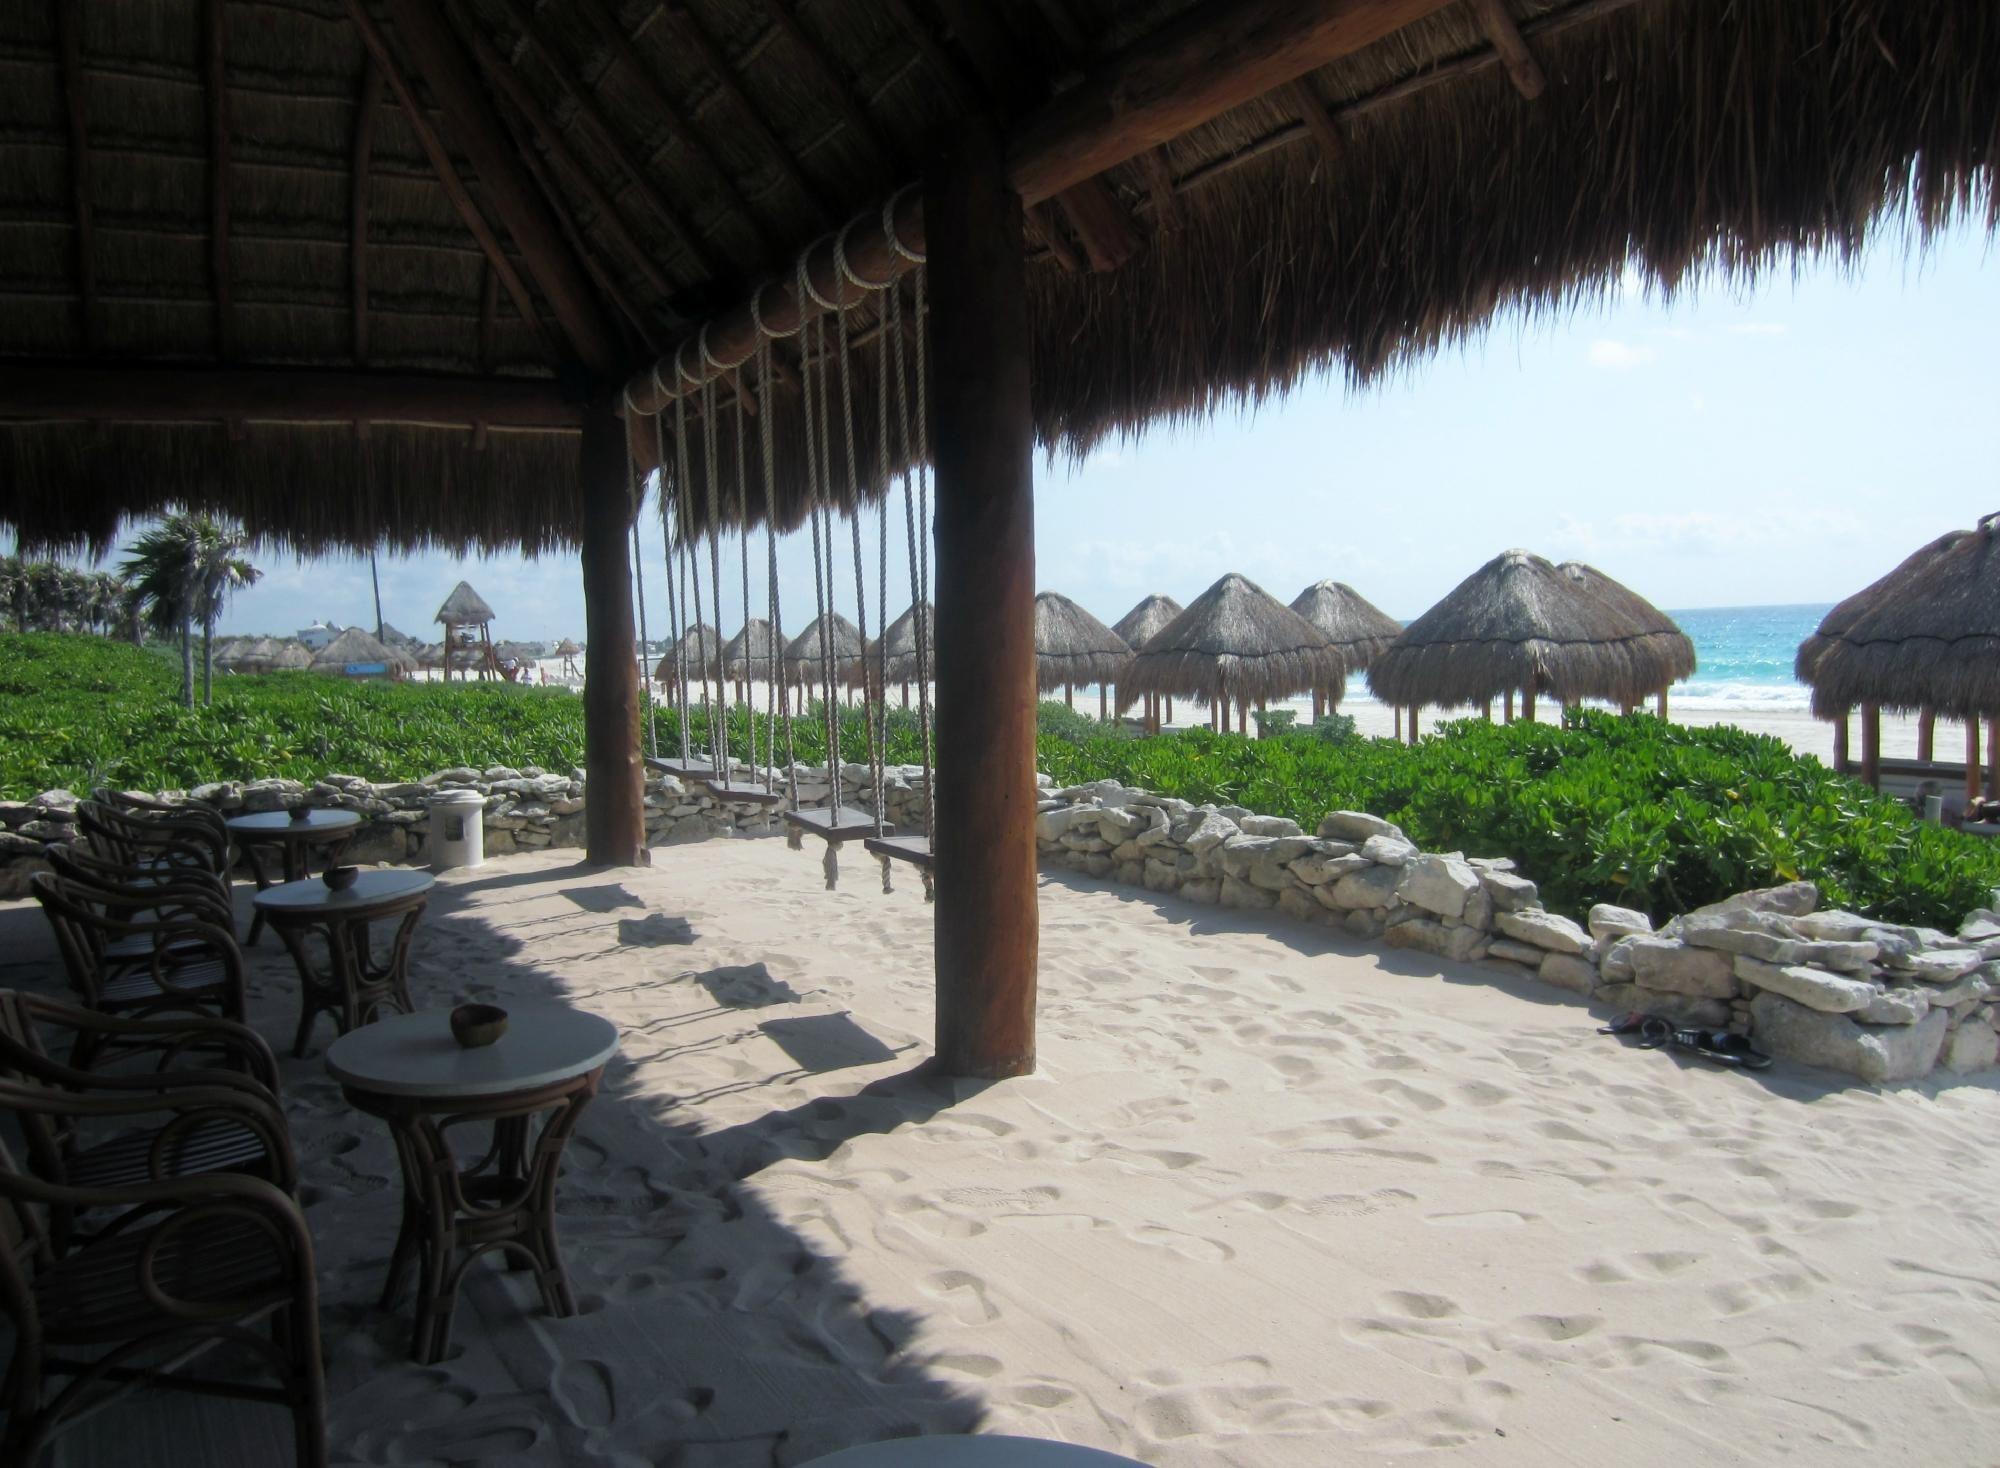 book valentin imperial maya riviera maya on tripadvisor see 10483 traveler reviews 15633